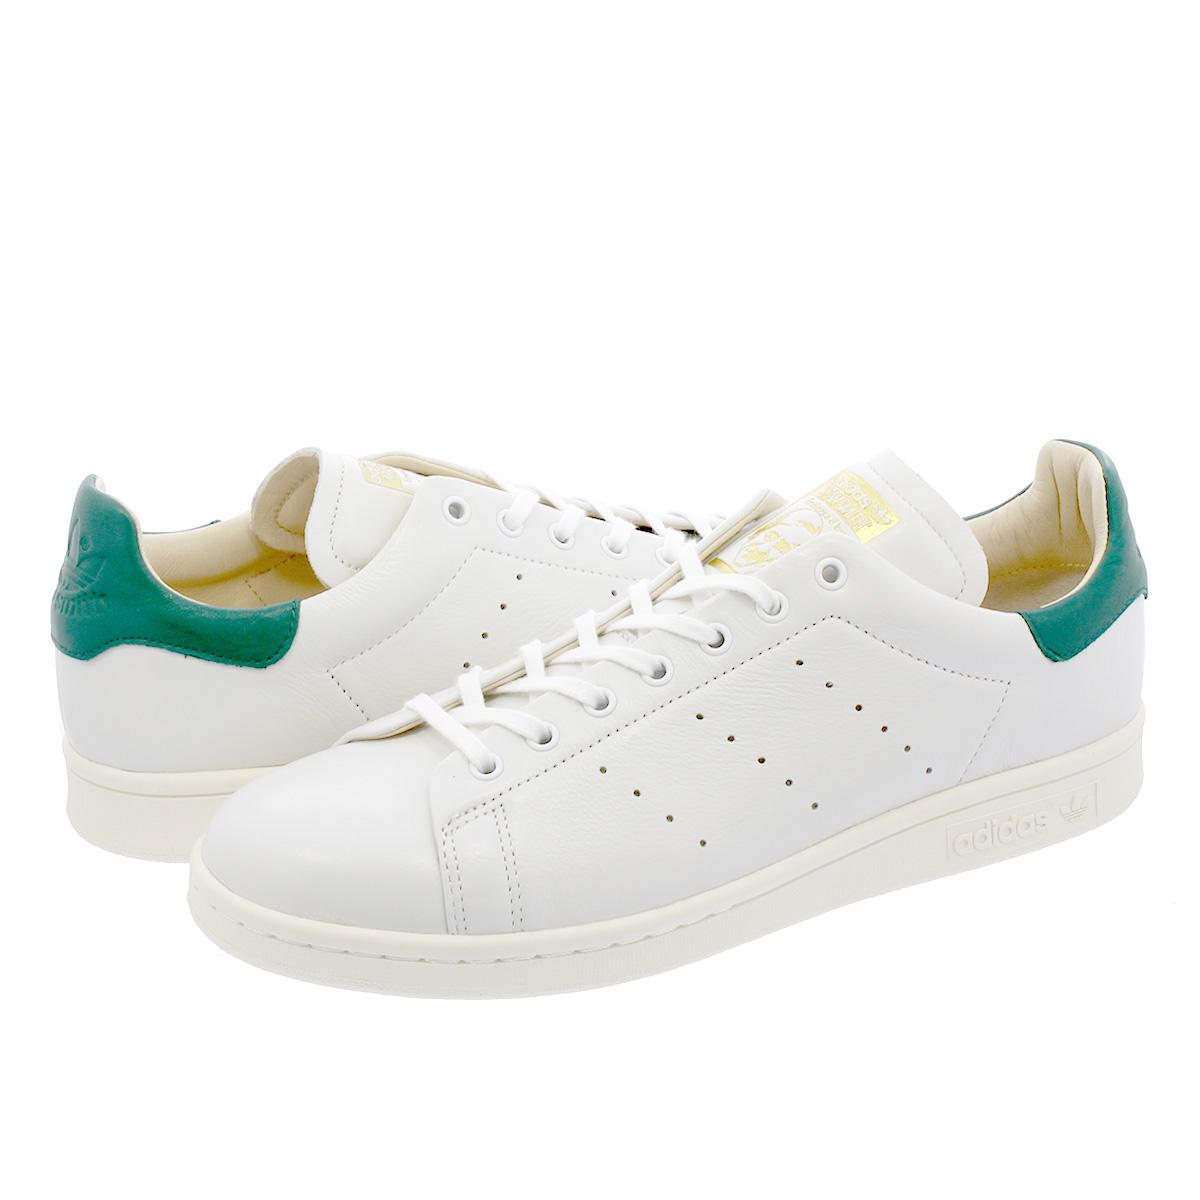 adidas STAN SMITH RECON 【adidas Originals】 アディダス スタンスミス リーコン RUNNING WHITE/NOBLE GREEN aq0868